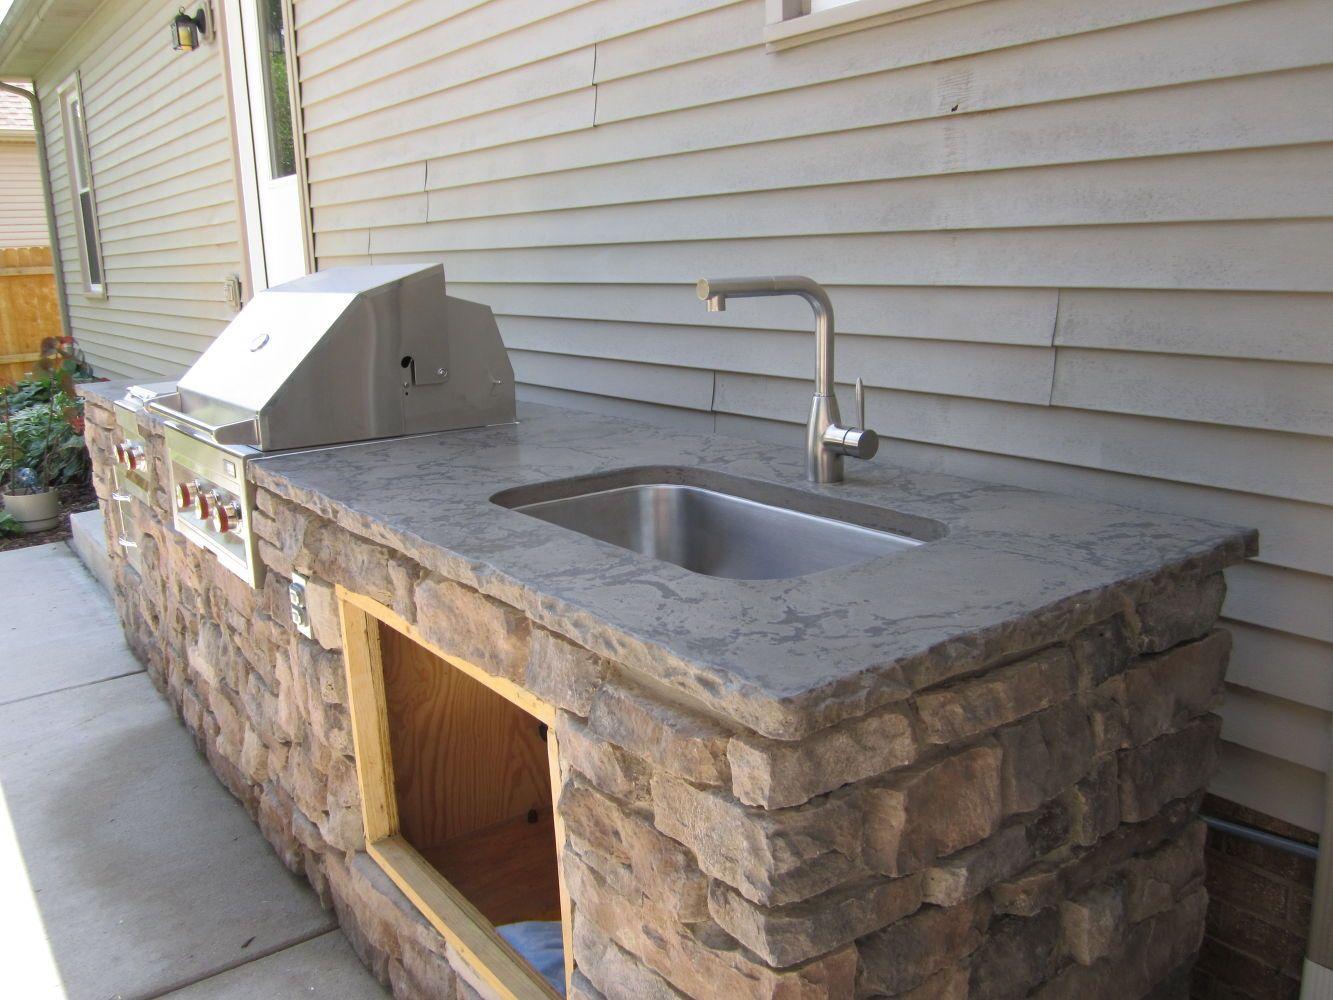 Home And Garden Diy Ideas Photos And Answers Outdoor Kitchen Outdoor Sinks Outdoor Kitchen Design